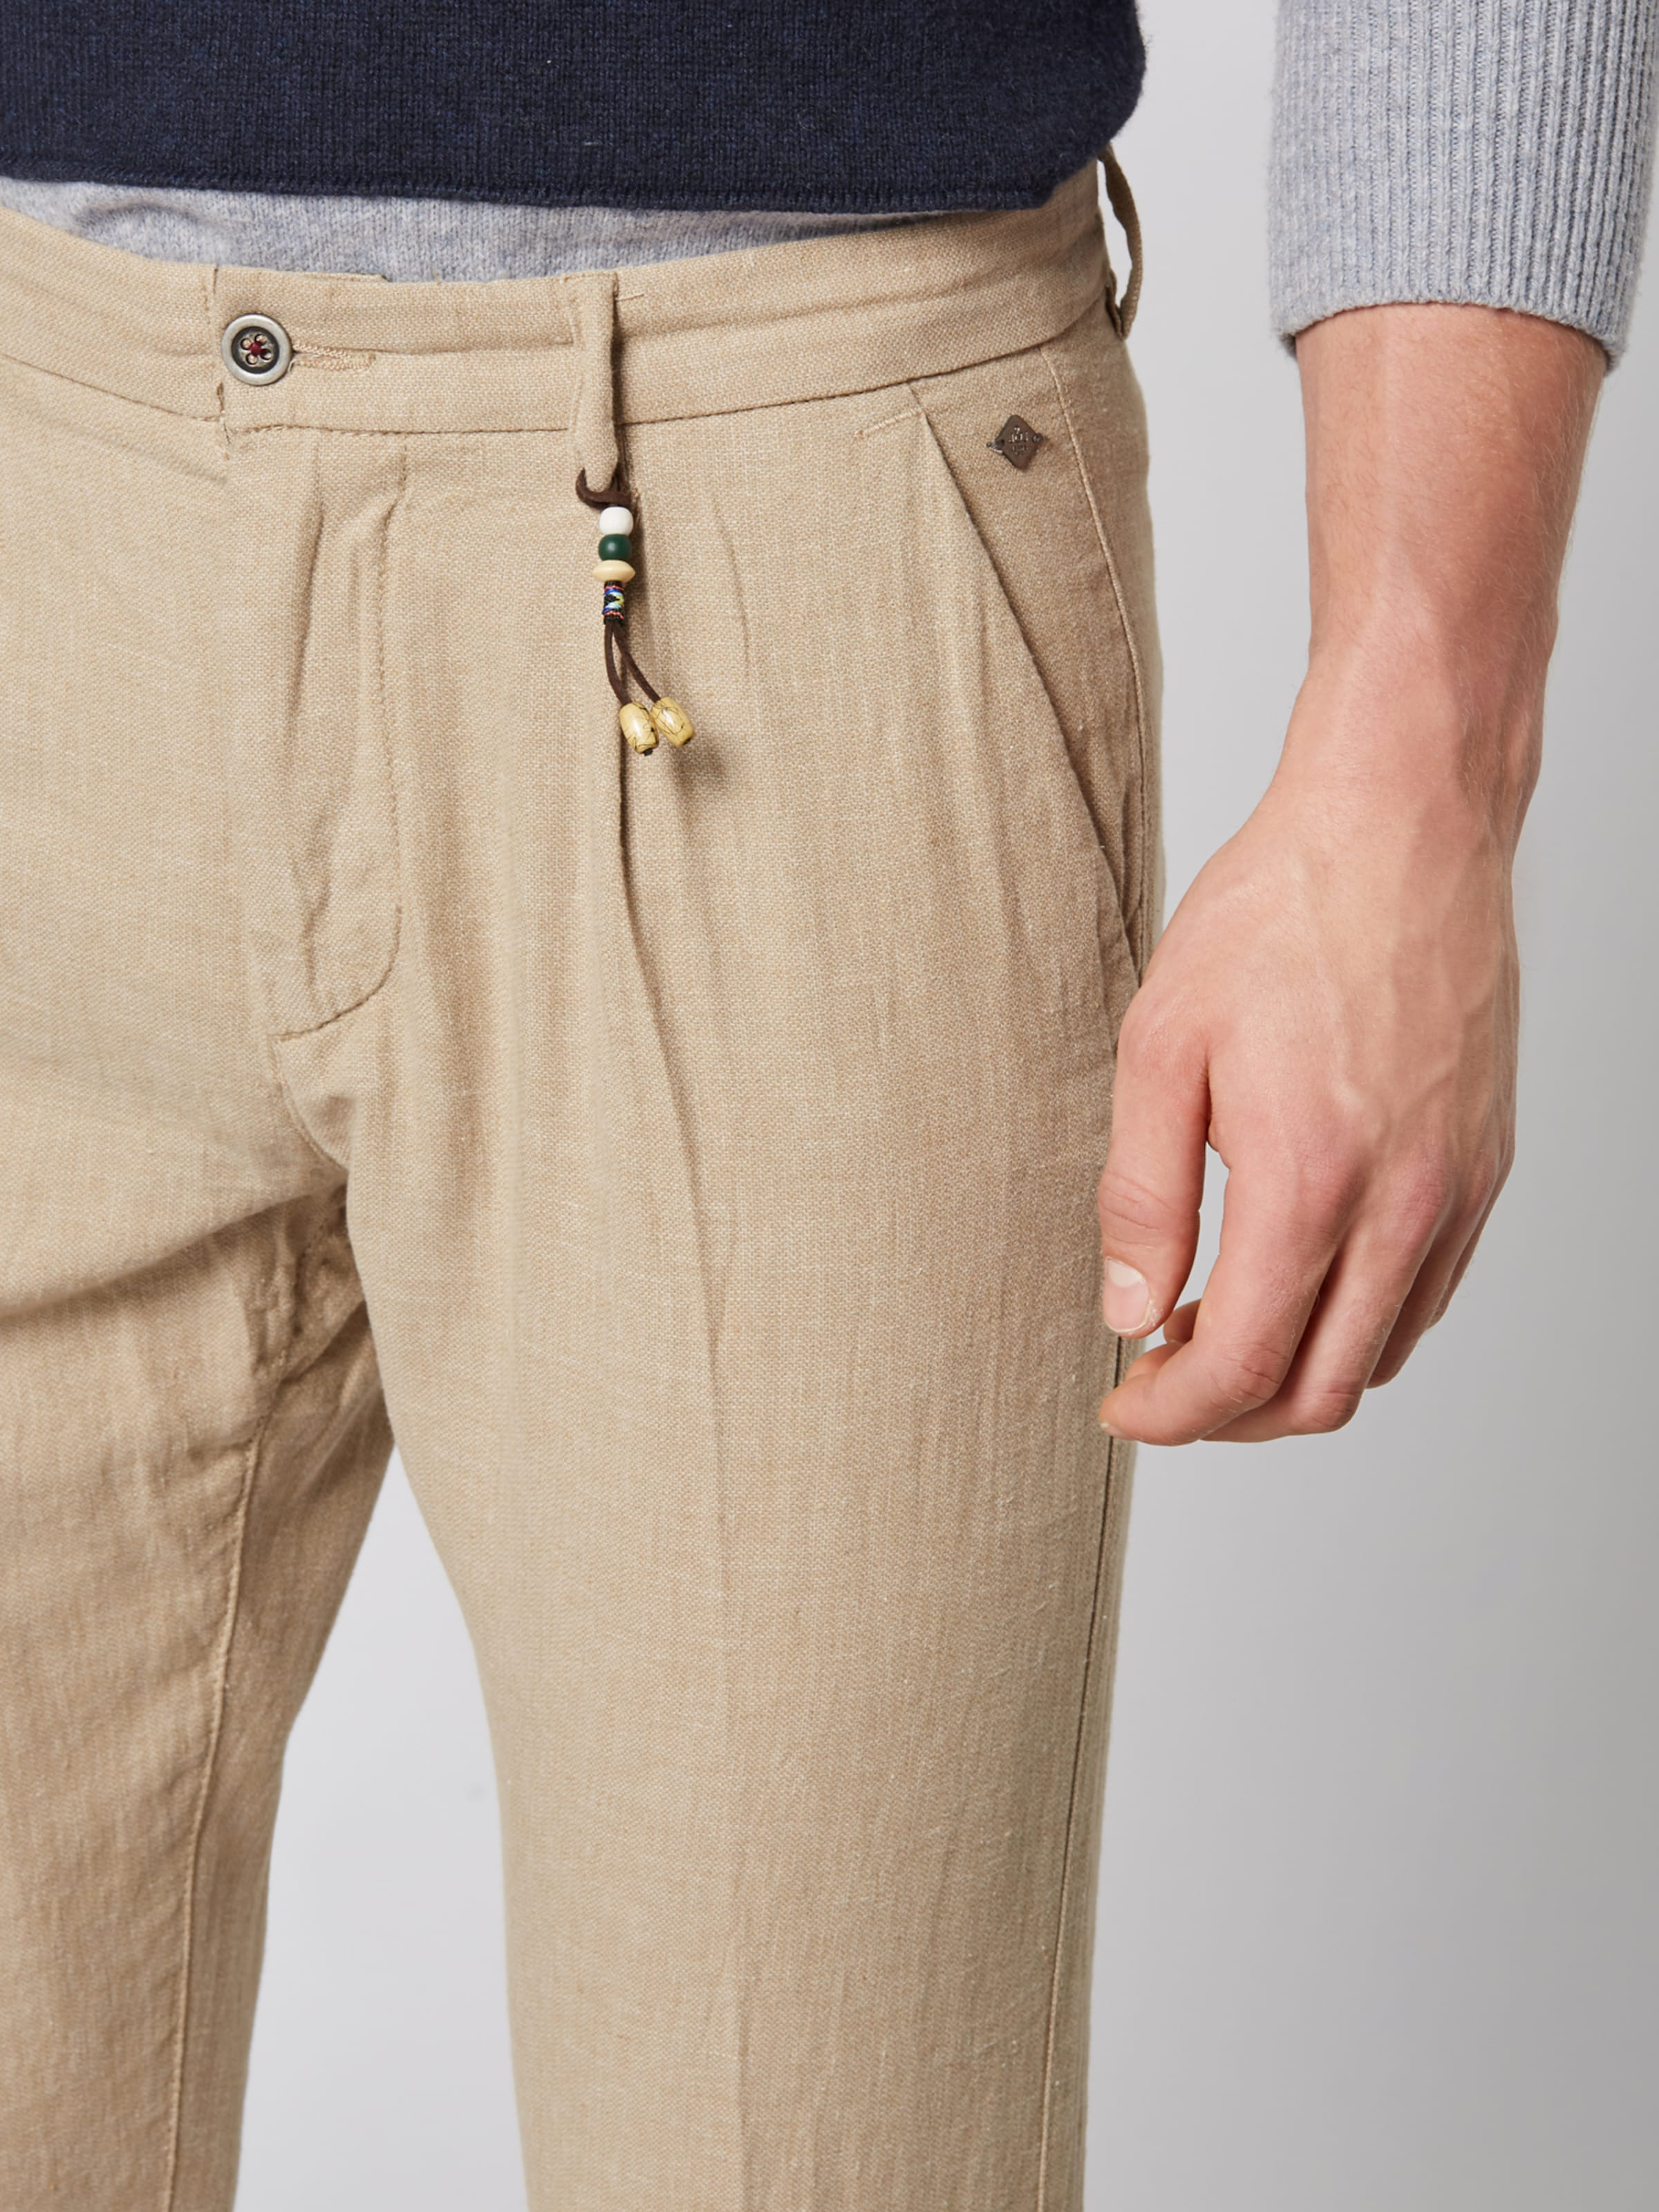 Chino BeigeNoisette En Jones Pantalon Jackamp; 'milton' O80kXnwP